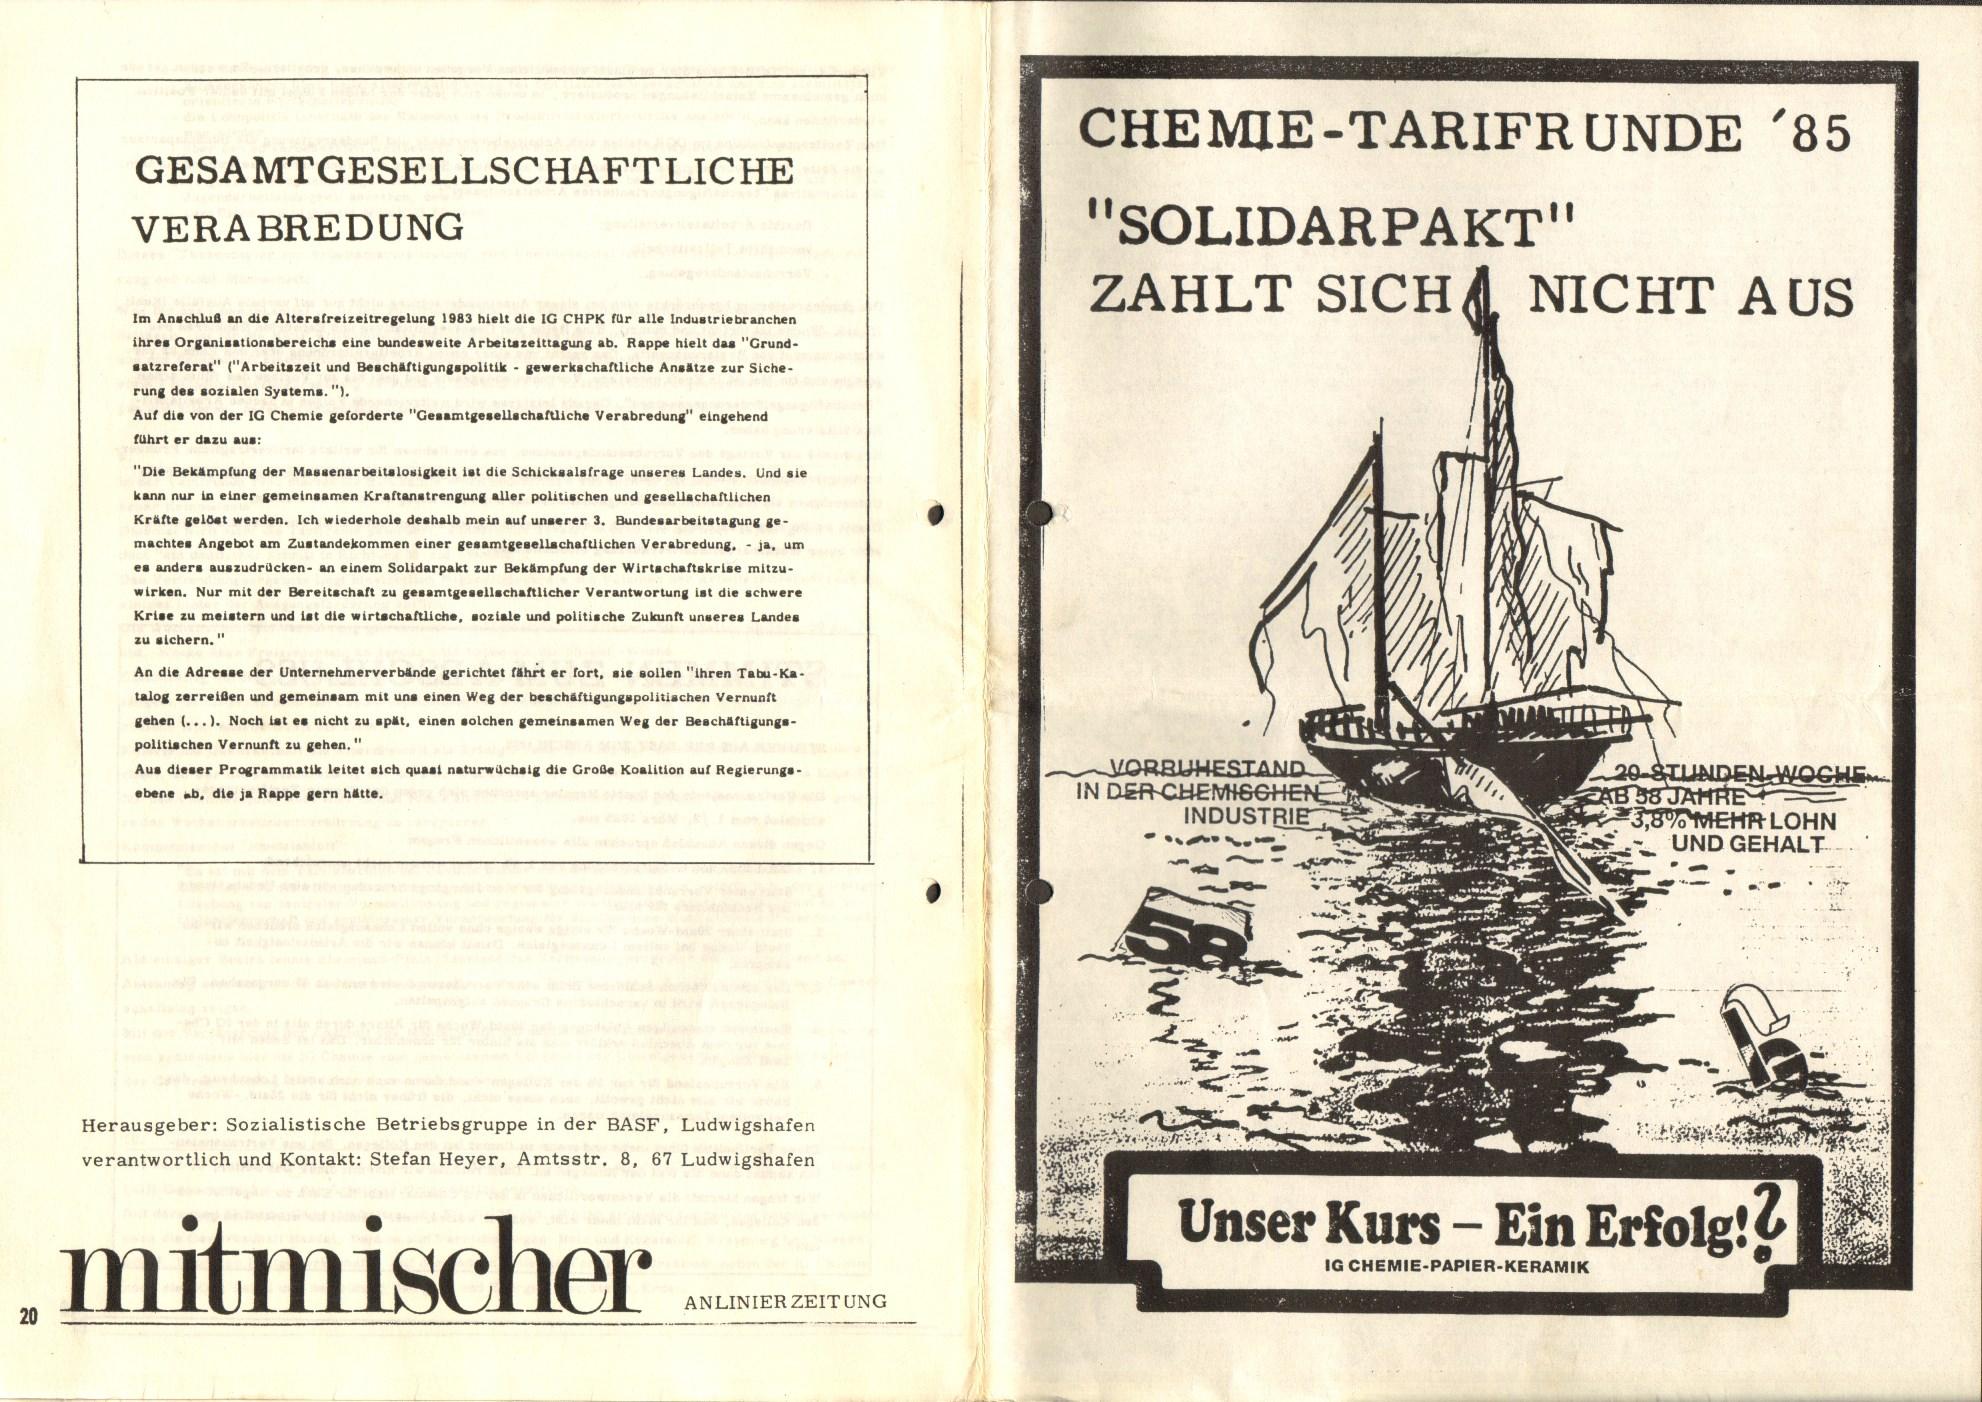 Ludwigshafen_BASF_Chemie_Tarifrunde_1985_01